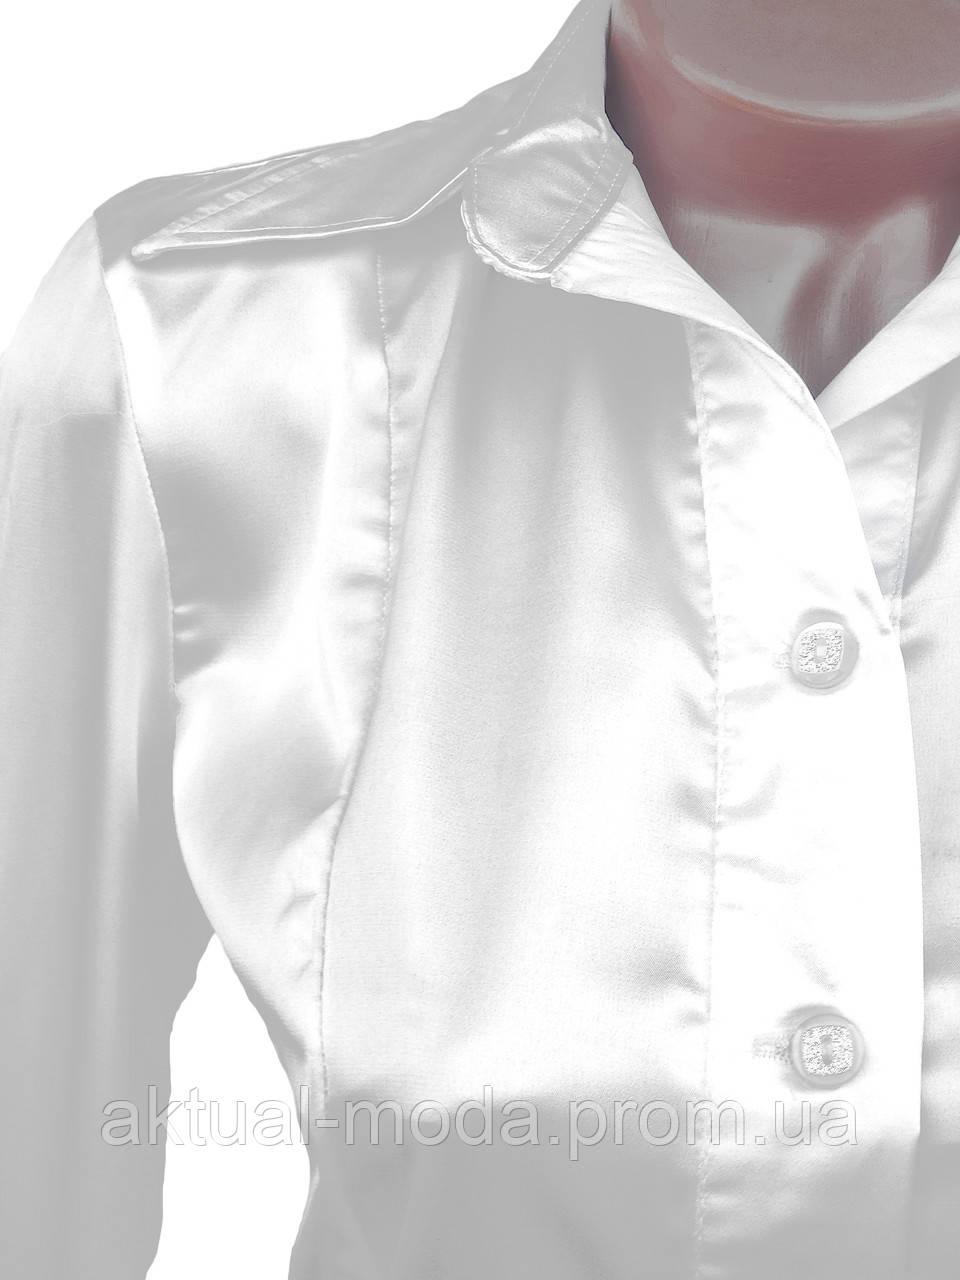 959a1165bb8 ... Женская атласная рубашка (48